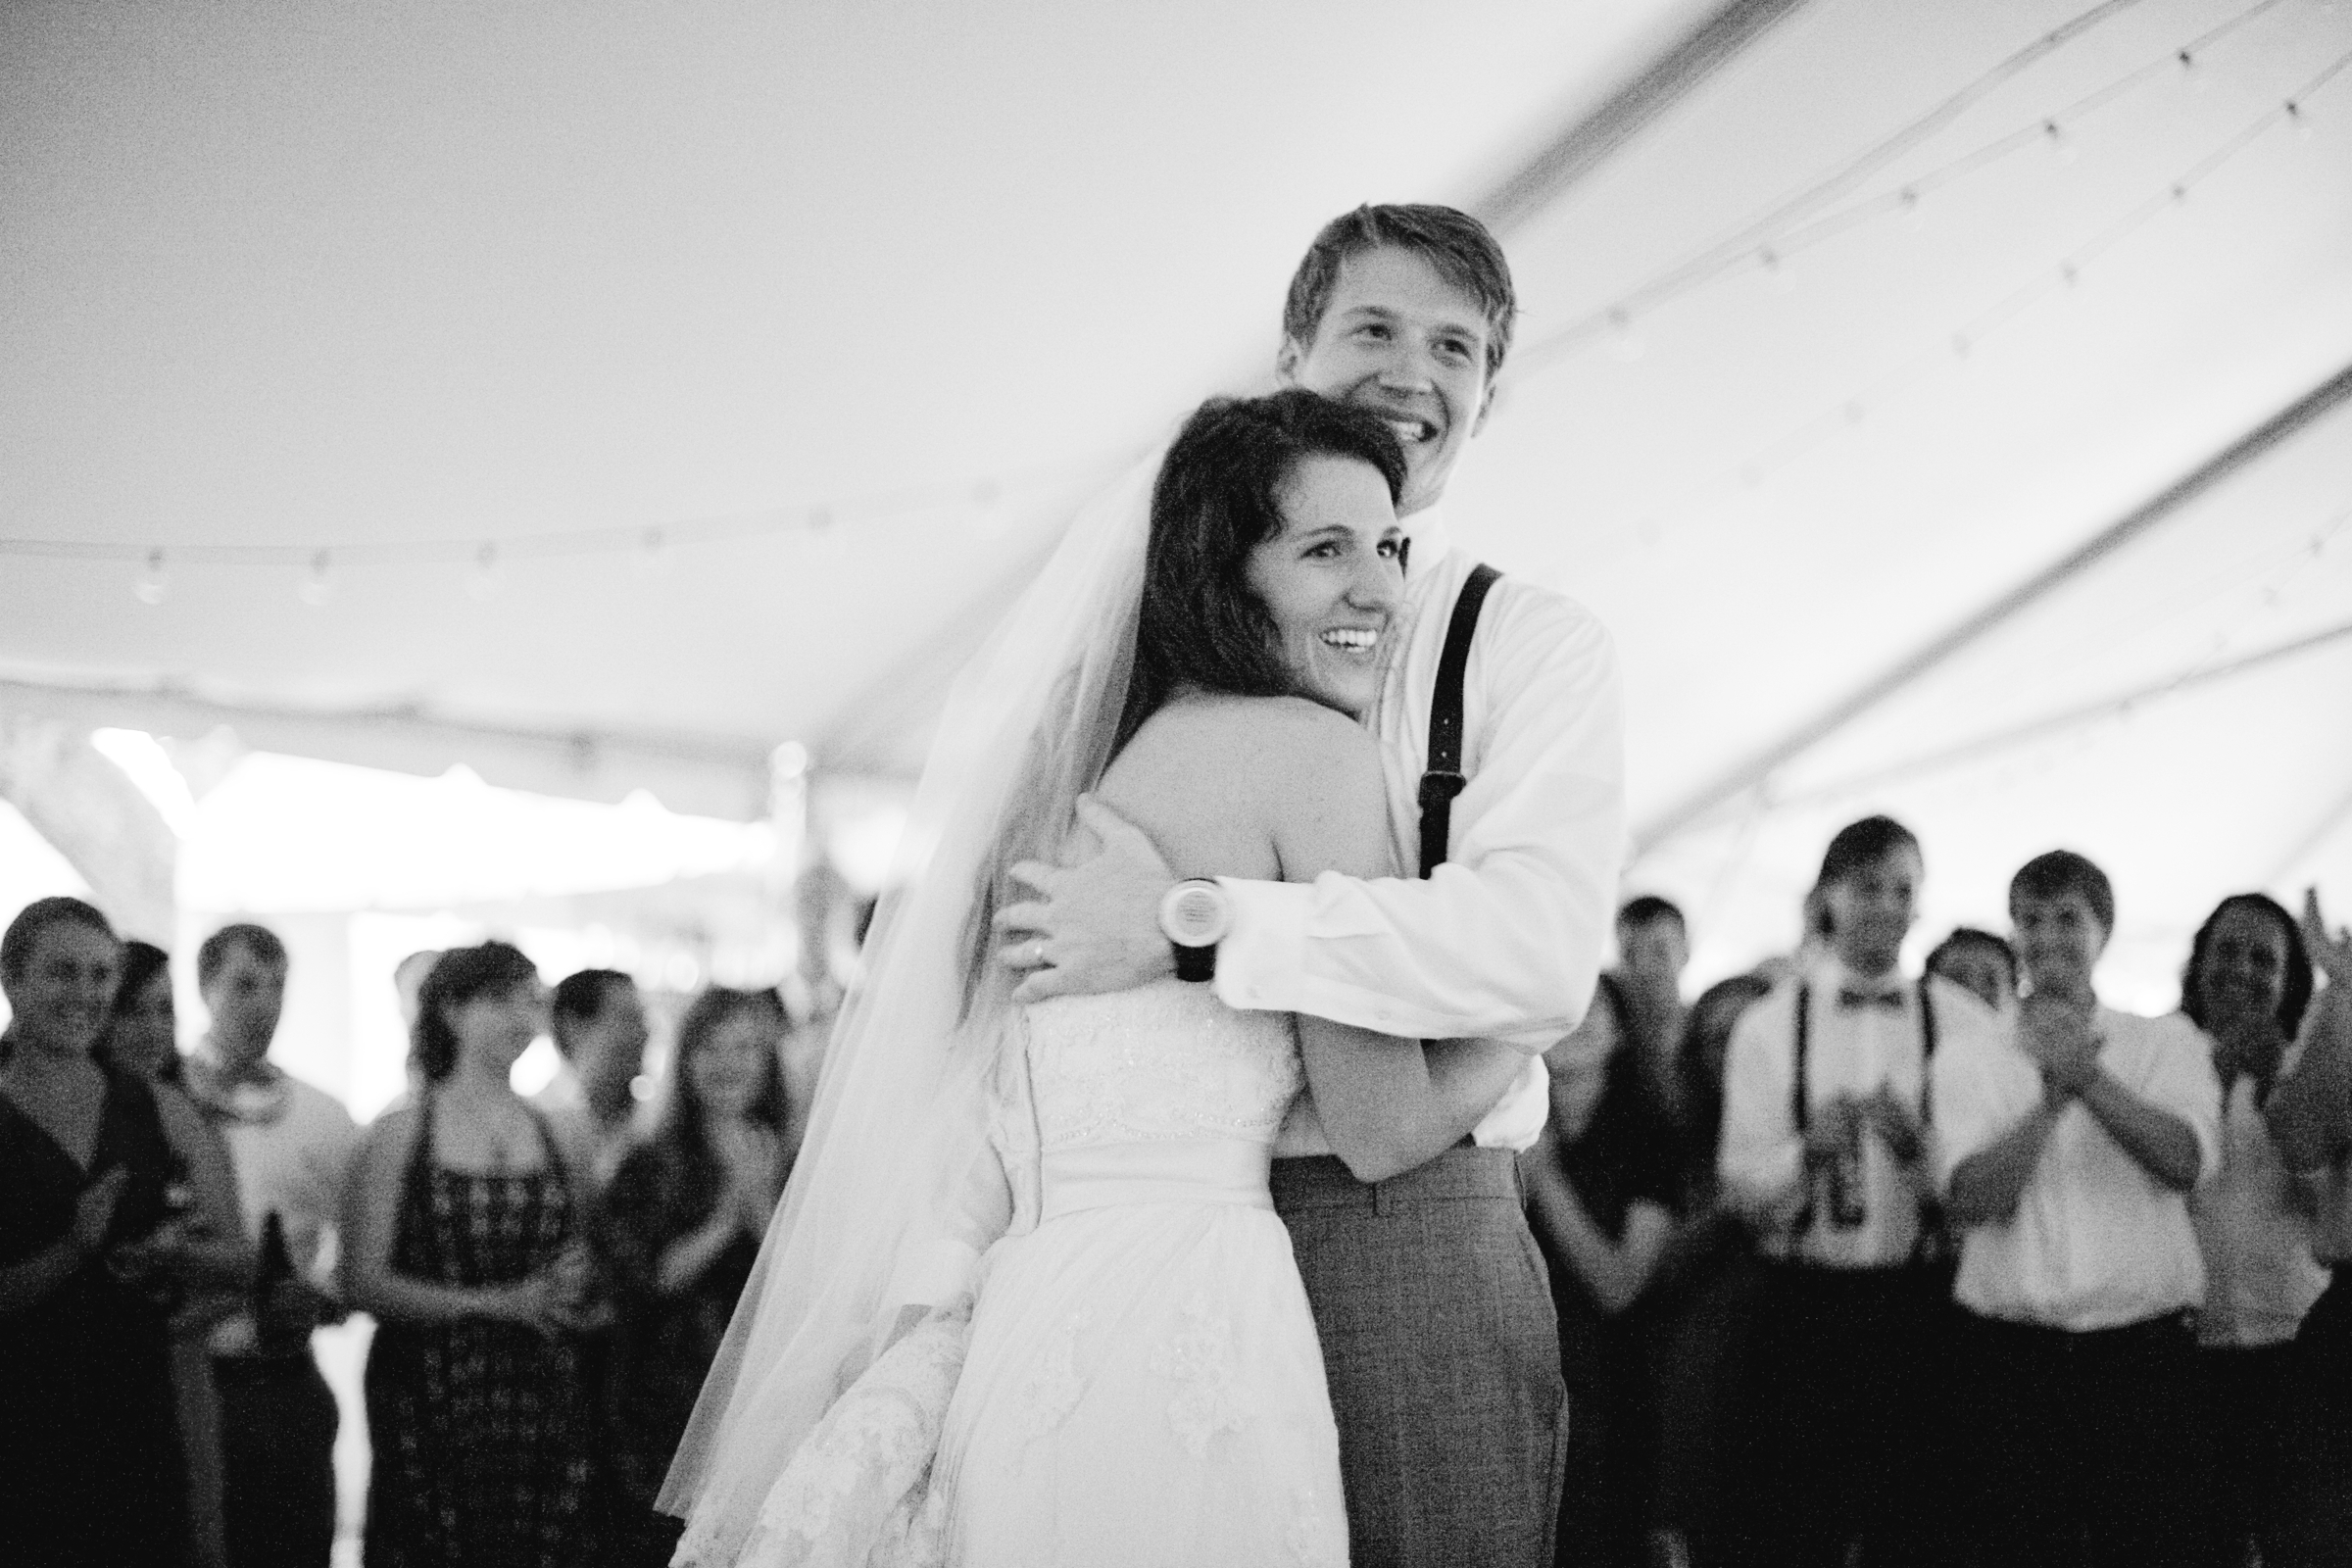 st_simons_island_wedding_photographer_shannon_griffin_0041.jpg